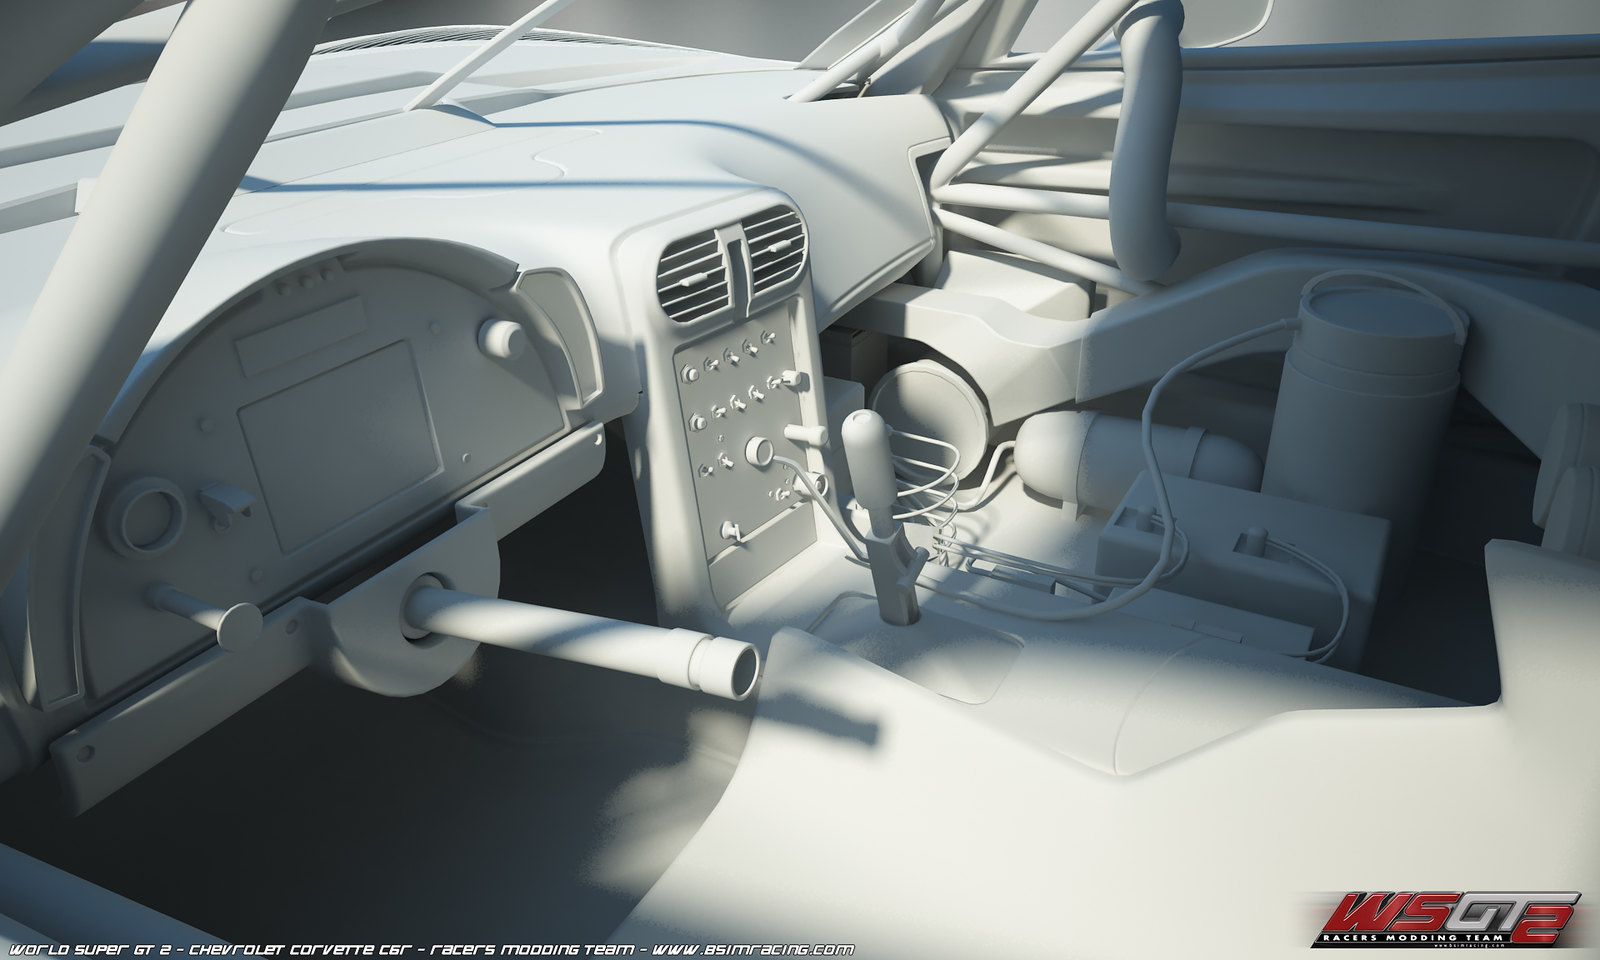 c6rcockpitpreview1uxwq